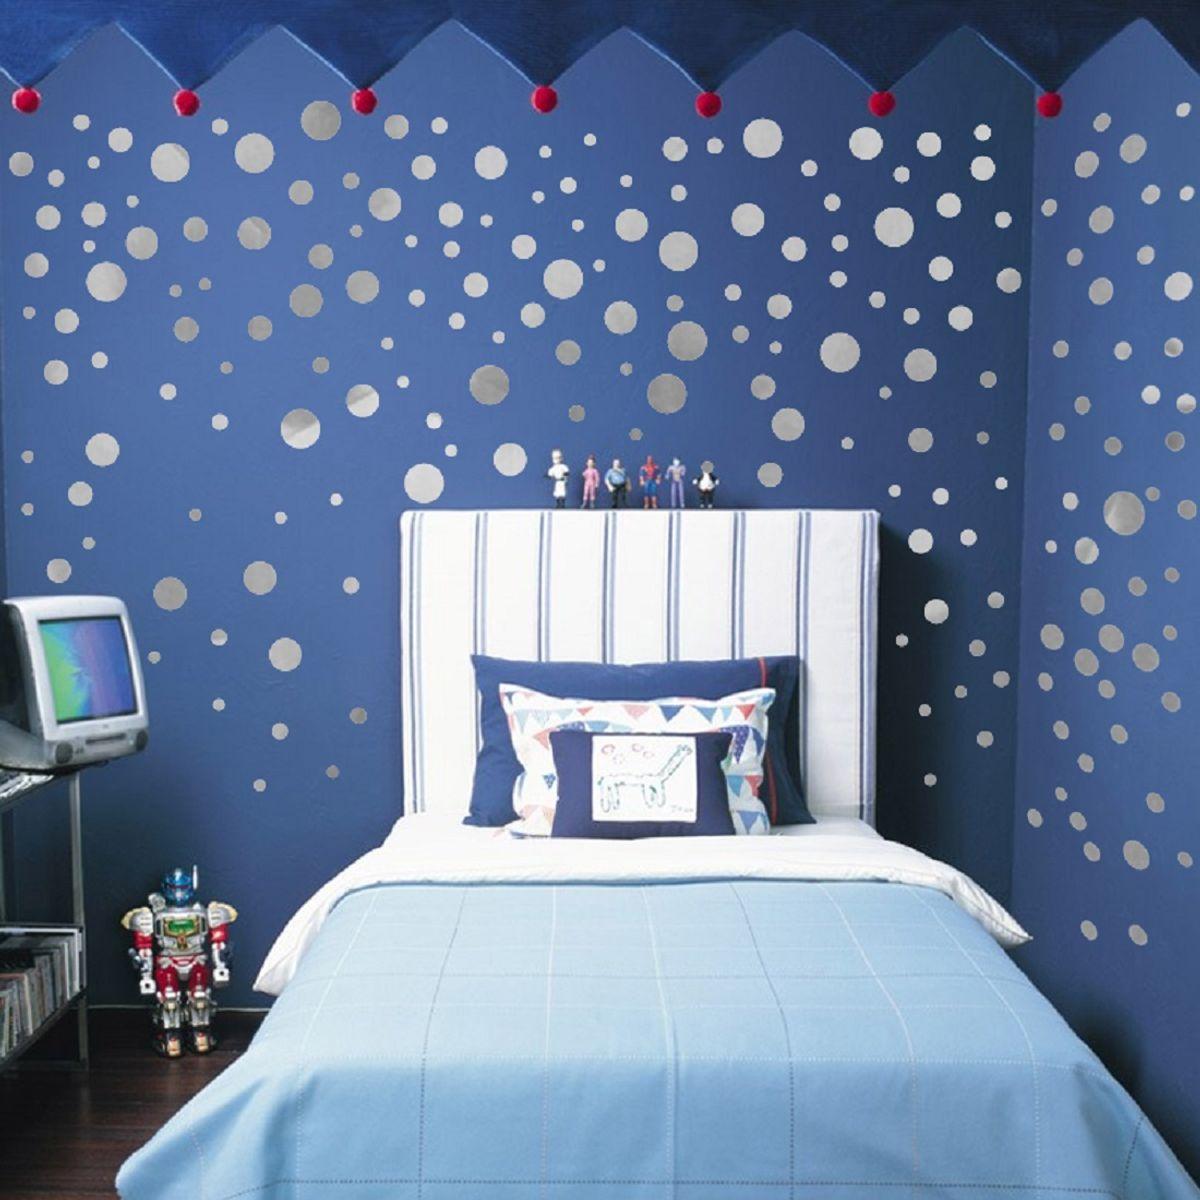 Jaamso Royals  silver film twinkle little Circle  Wall Sticker PVC Vinyl 45 cm X 50 cmDecorative  Stickers